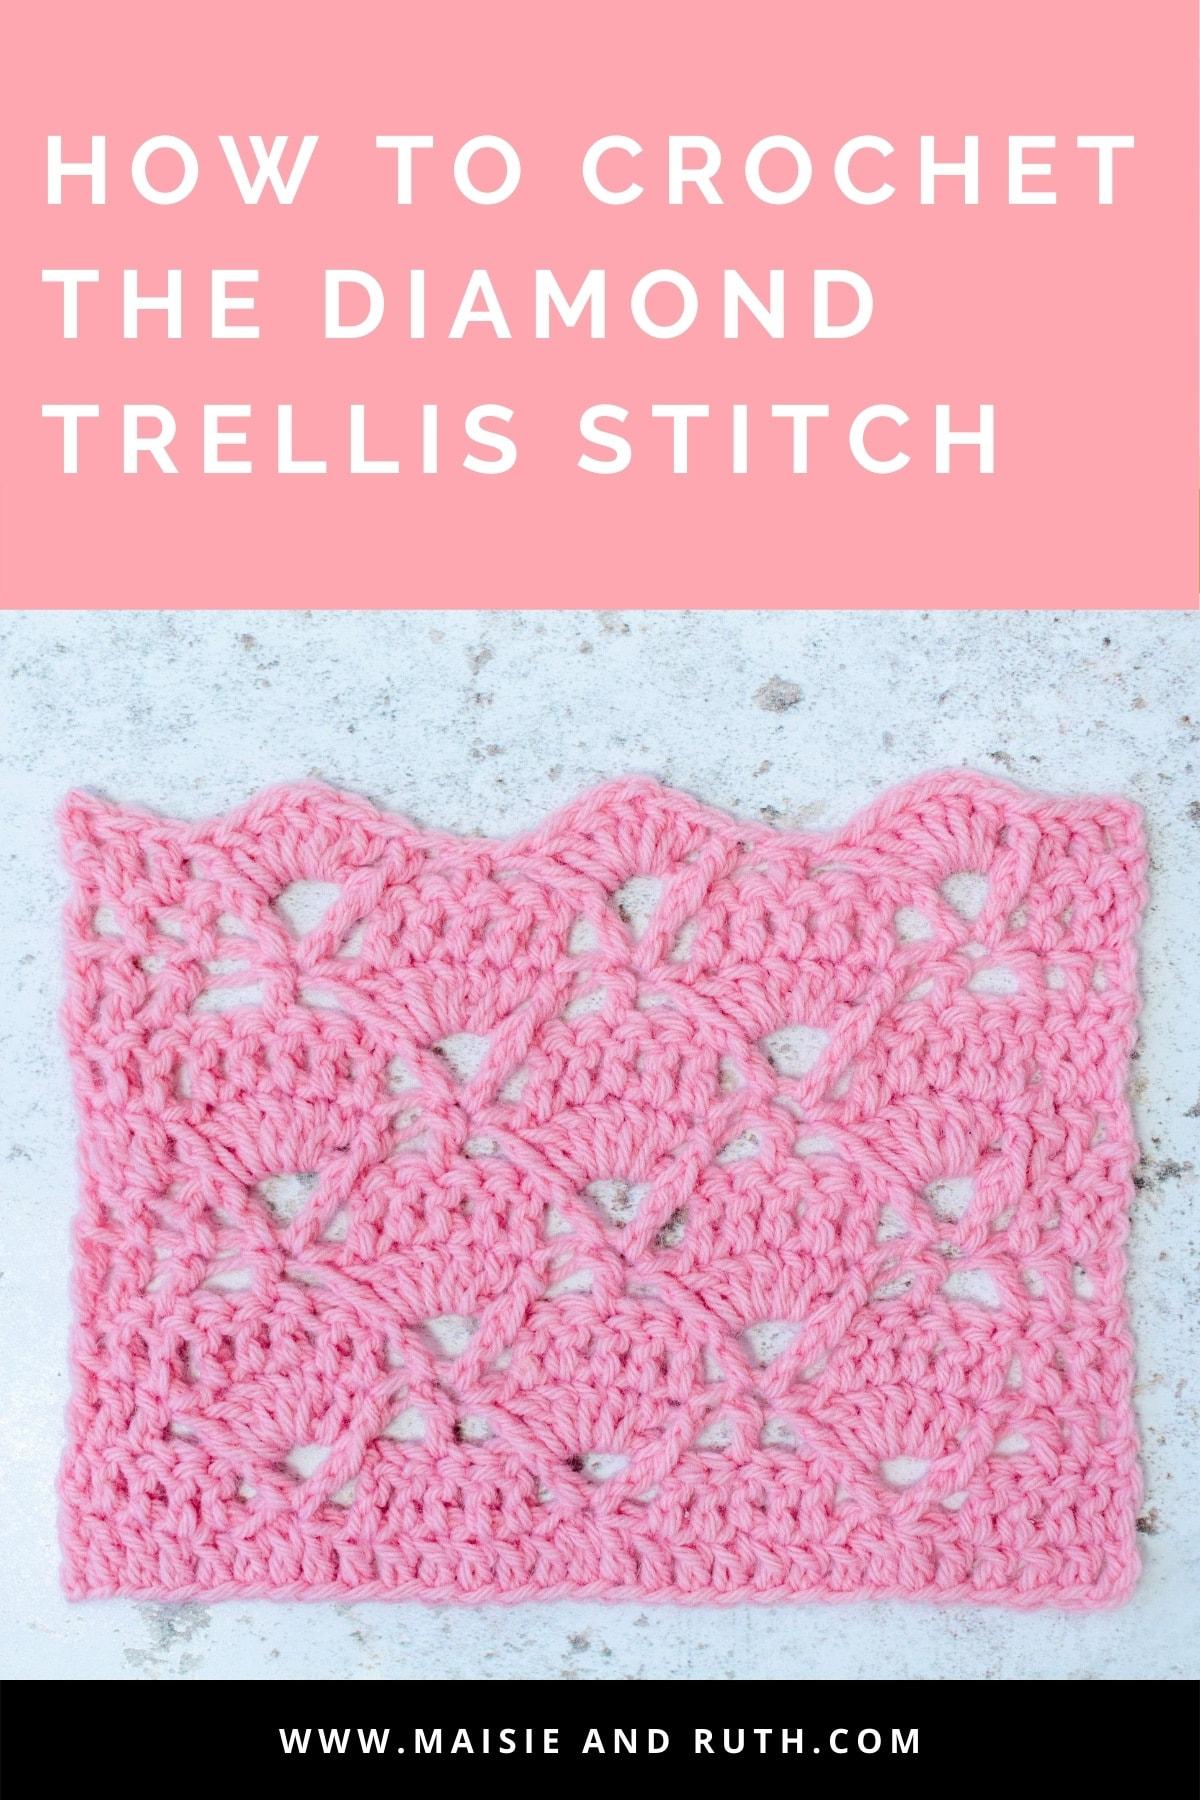 Diamond Trellis Stitch Pin Design 1